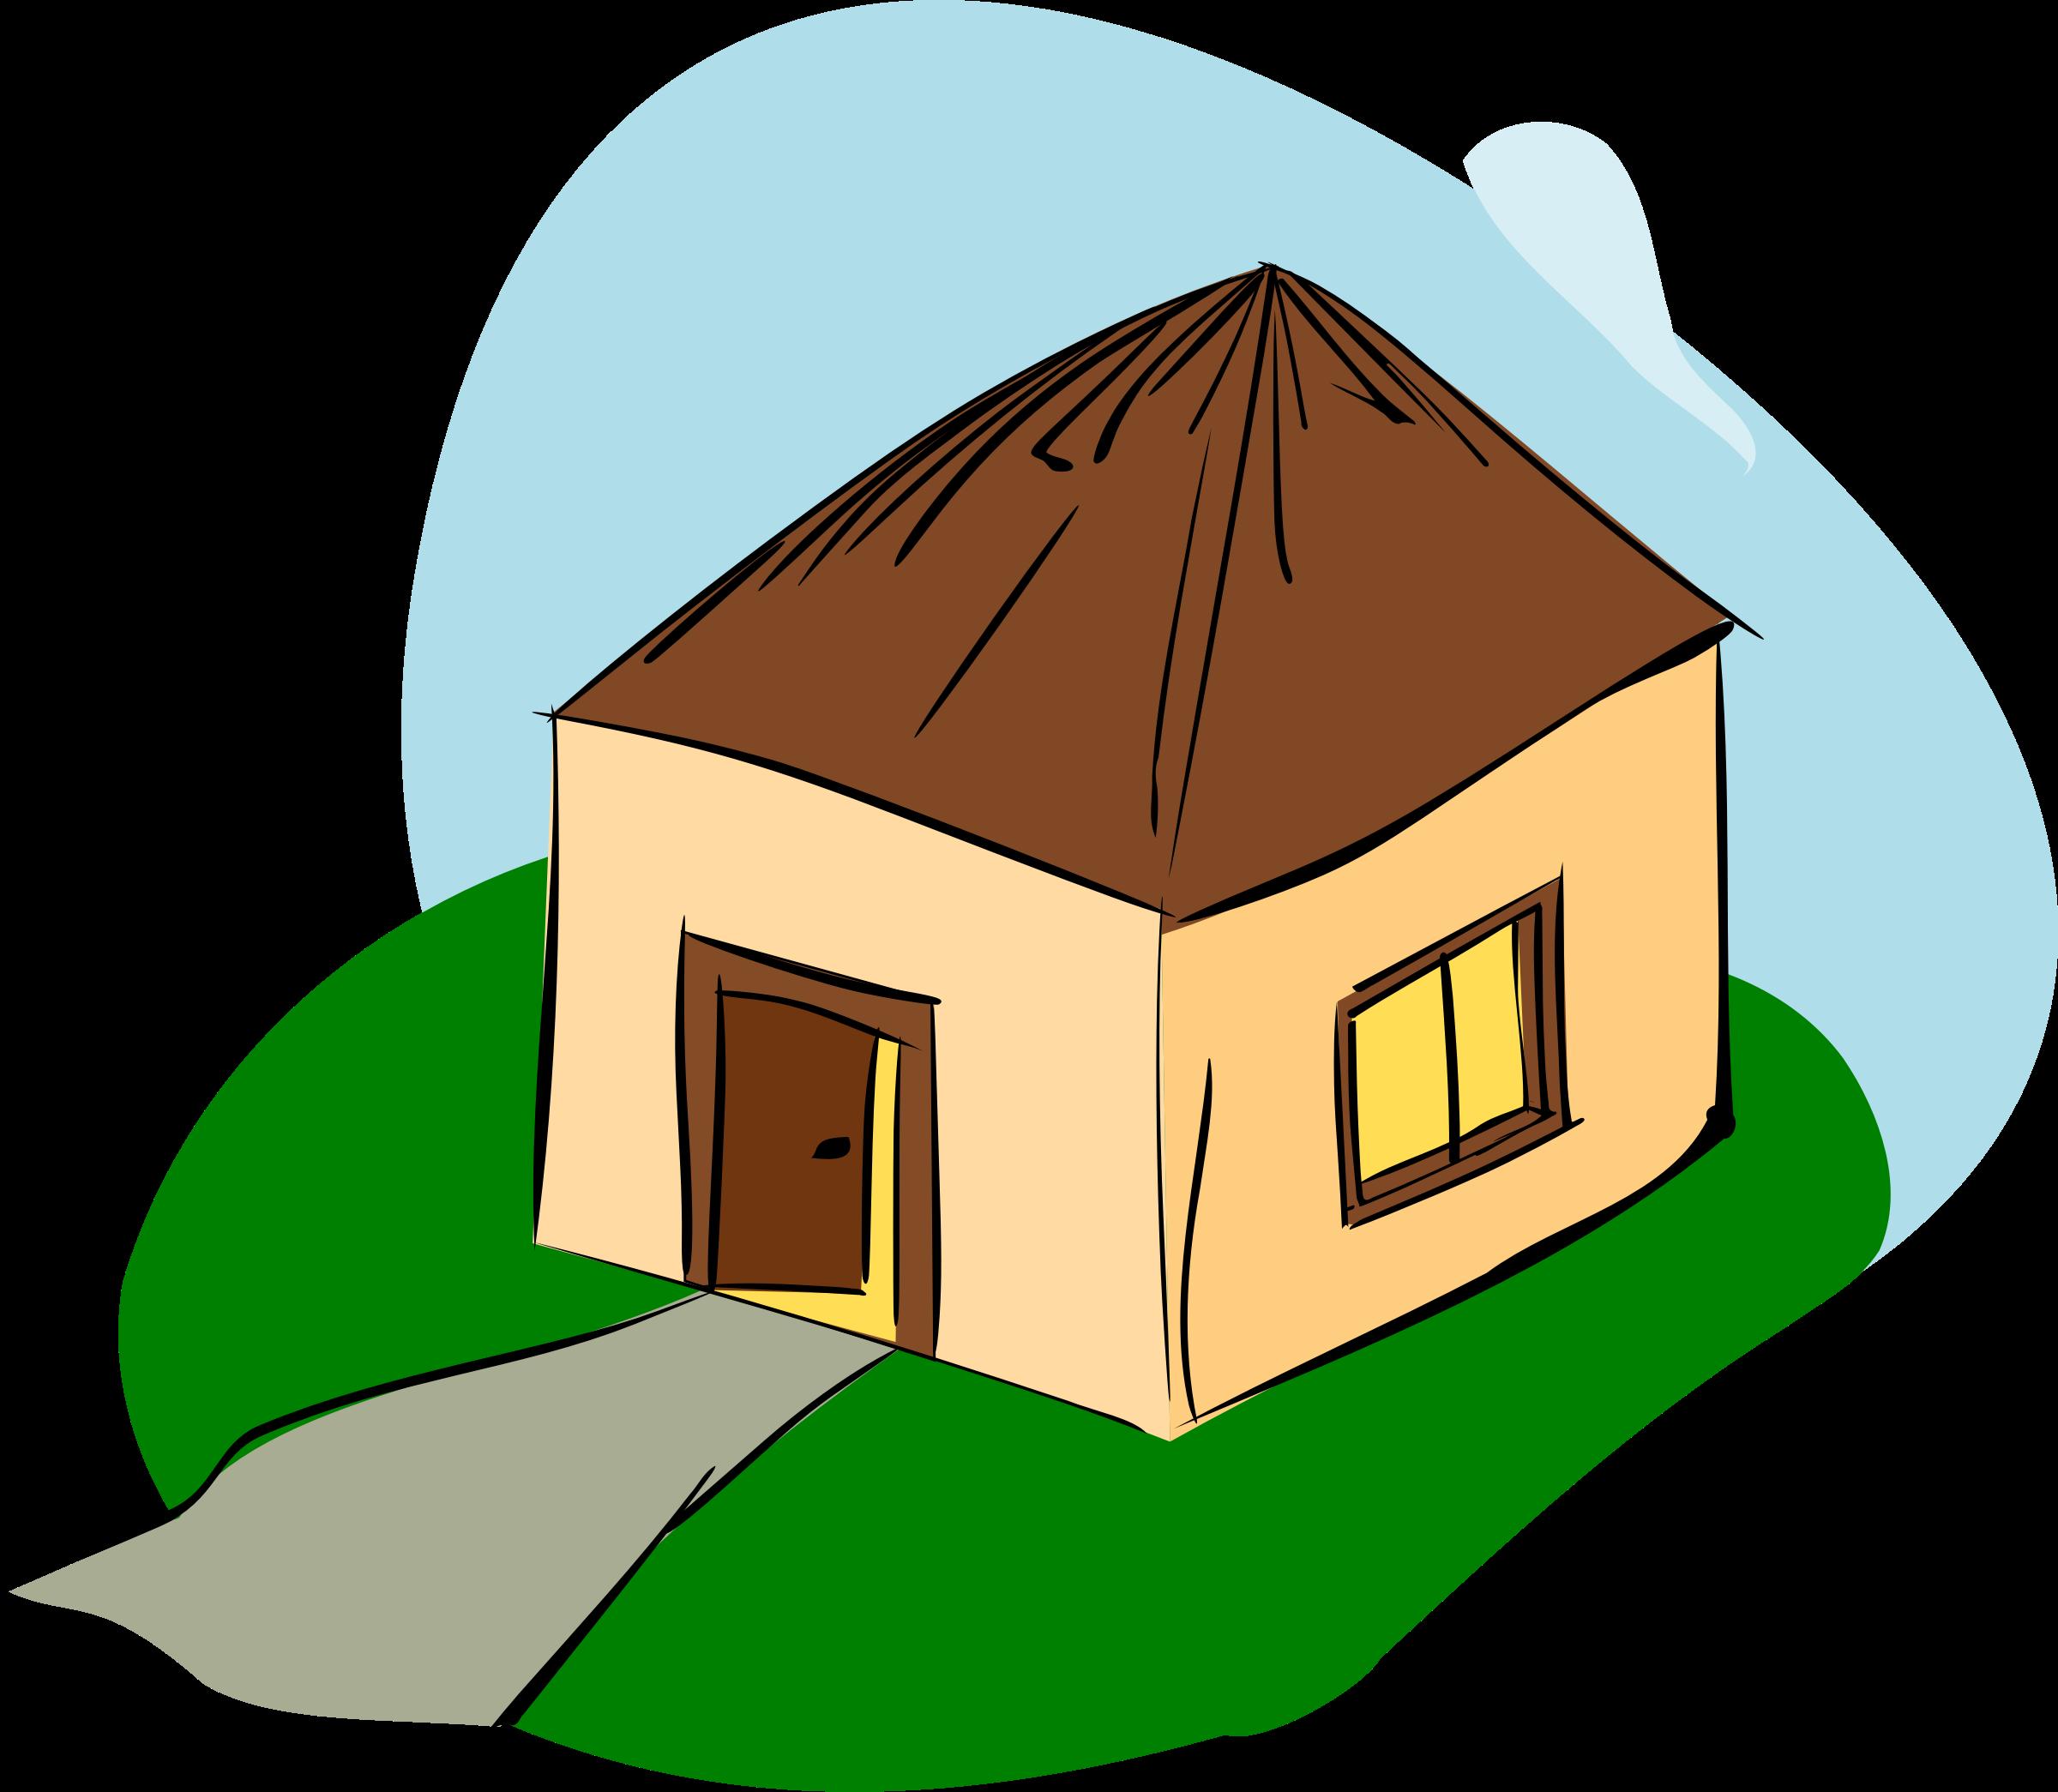 Clipart Hut